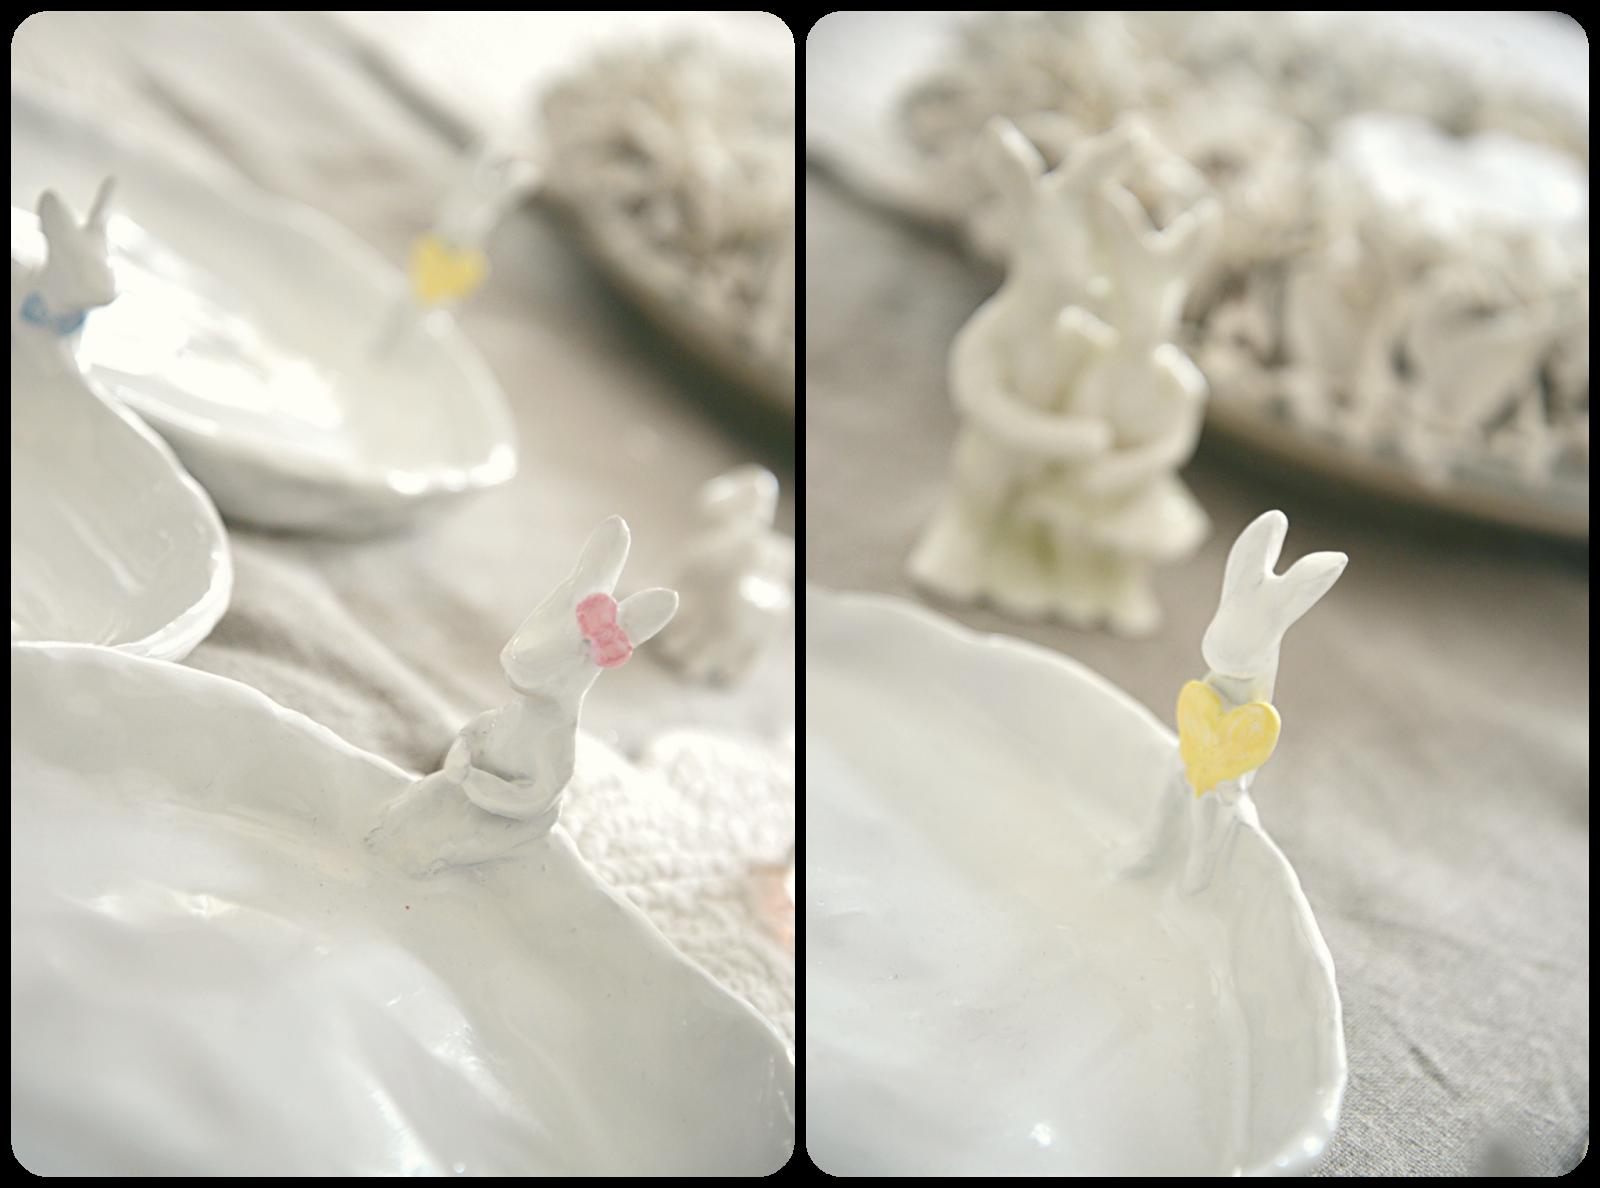 kaunis pieni elämä: Pääsiäispuuhia